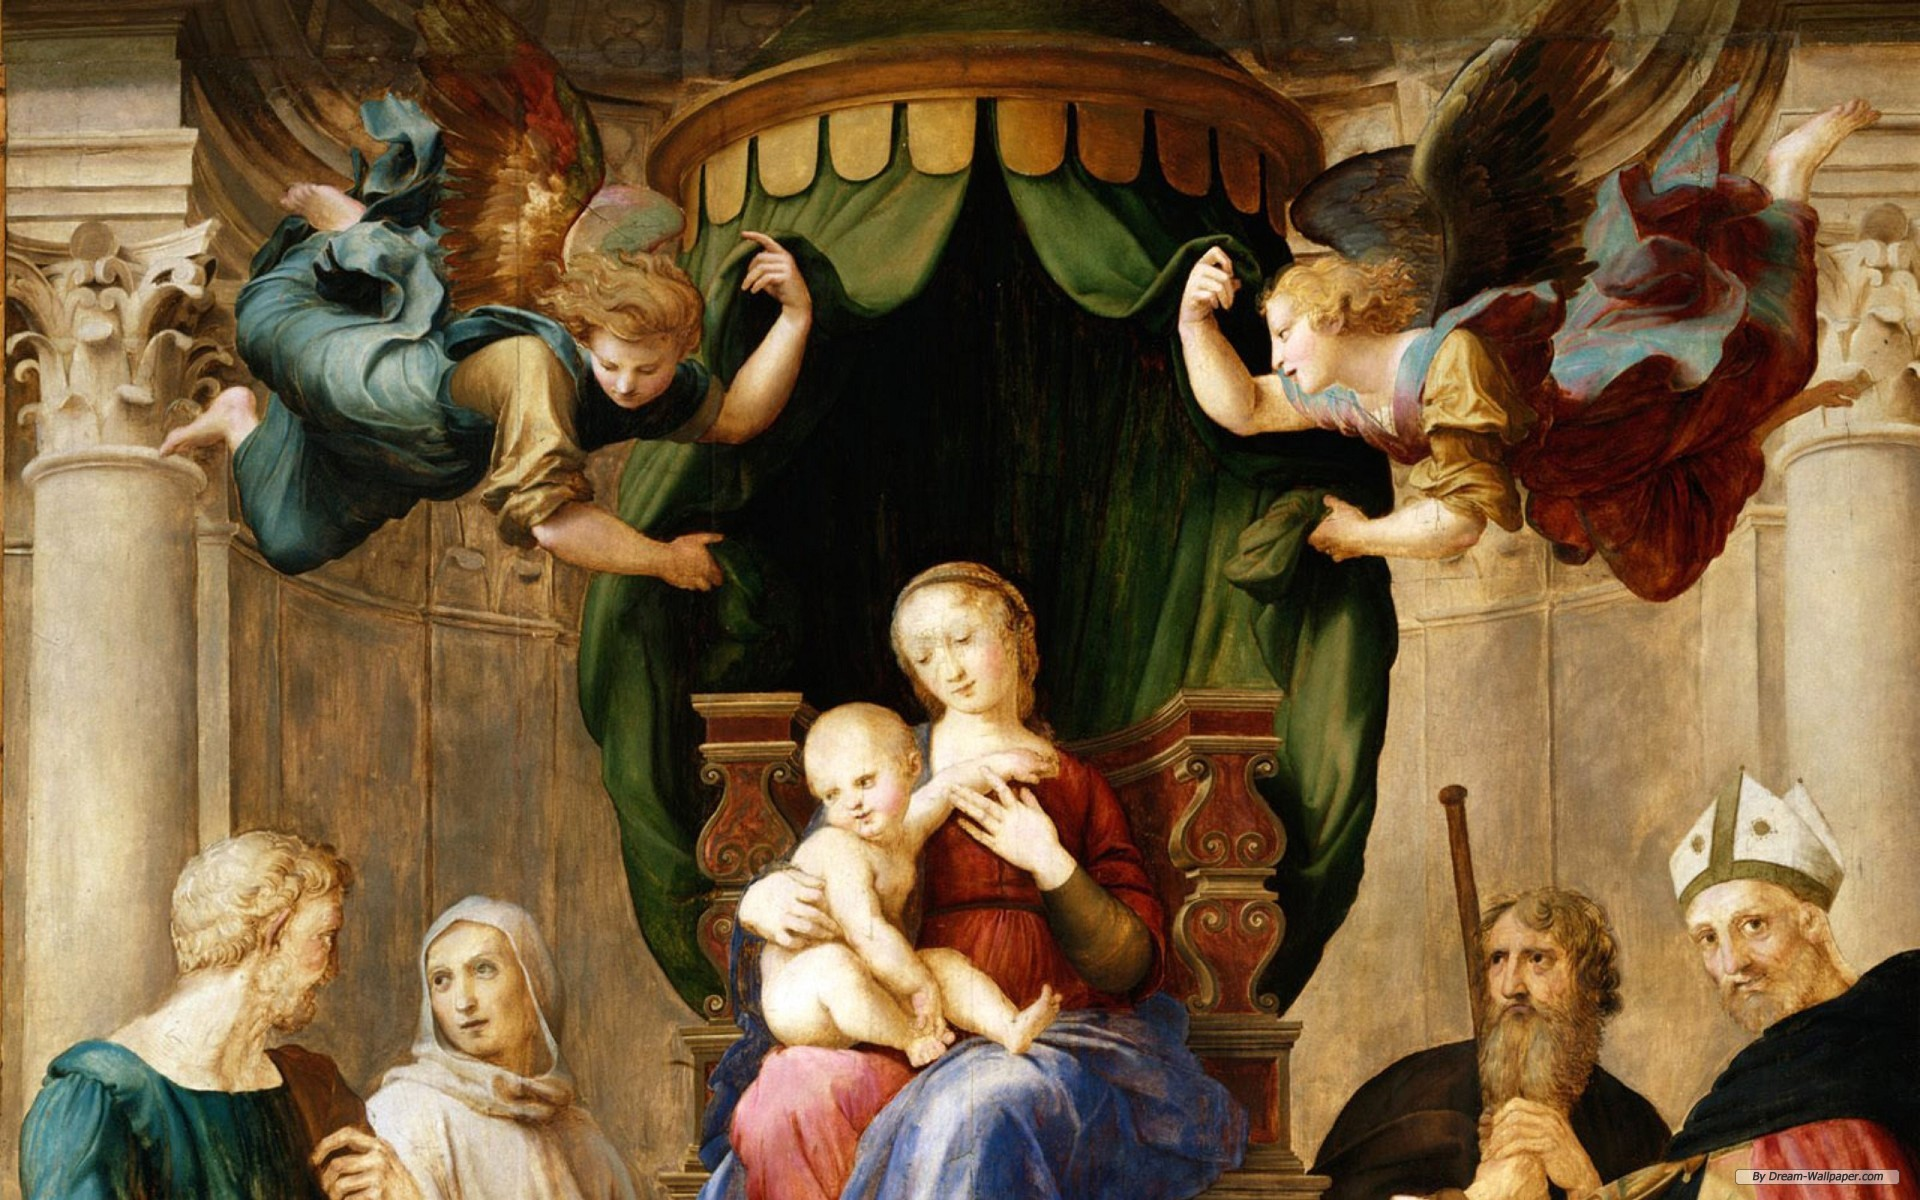 Рафаэль. Мадонна под балдахином (фрагмент). 1507-08